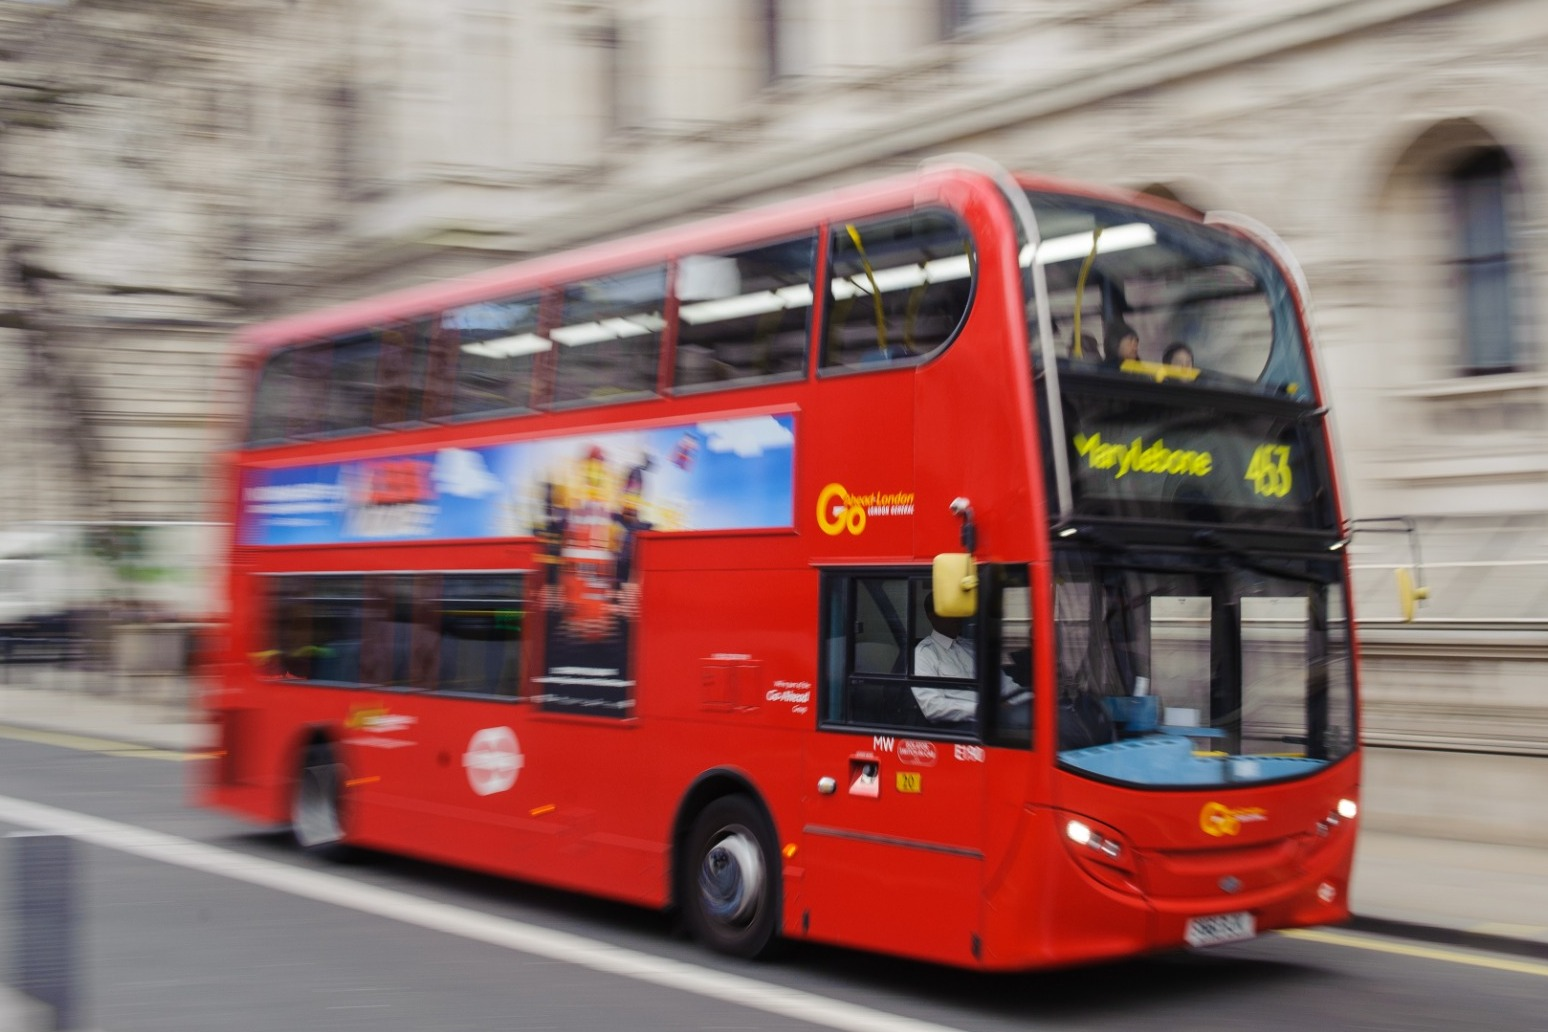 Bus services delayed by fuel crisis